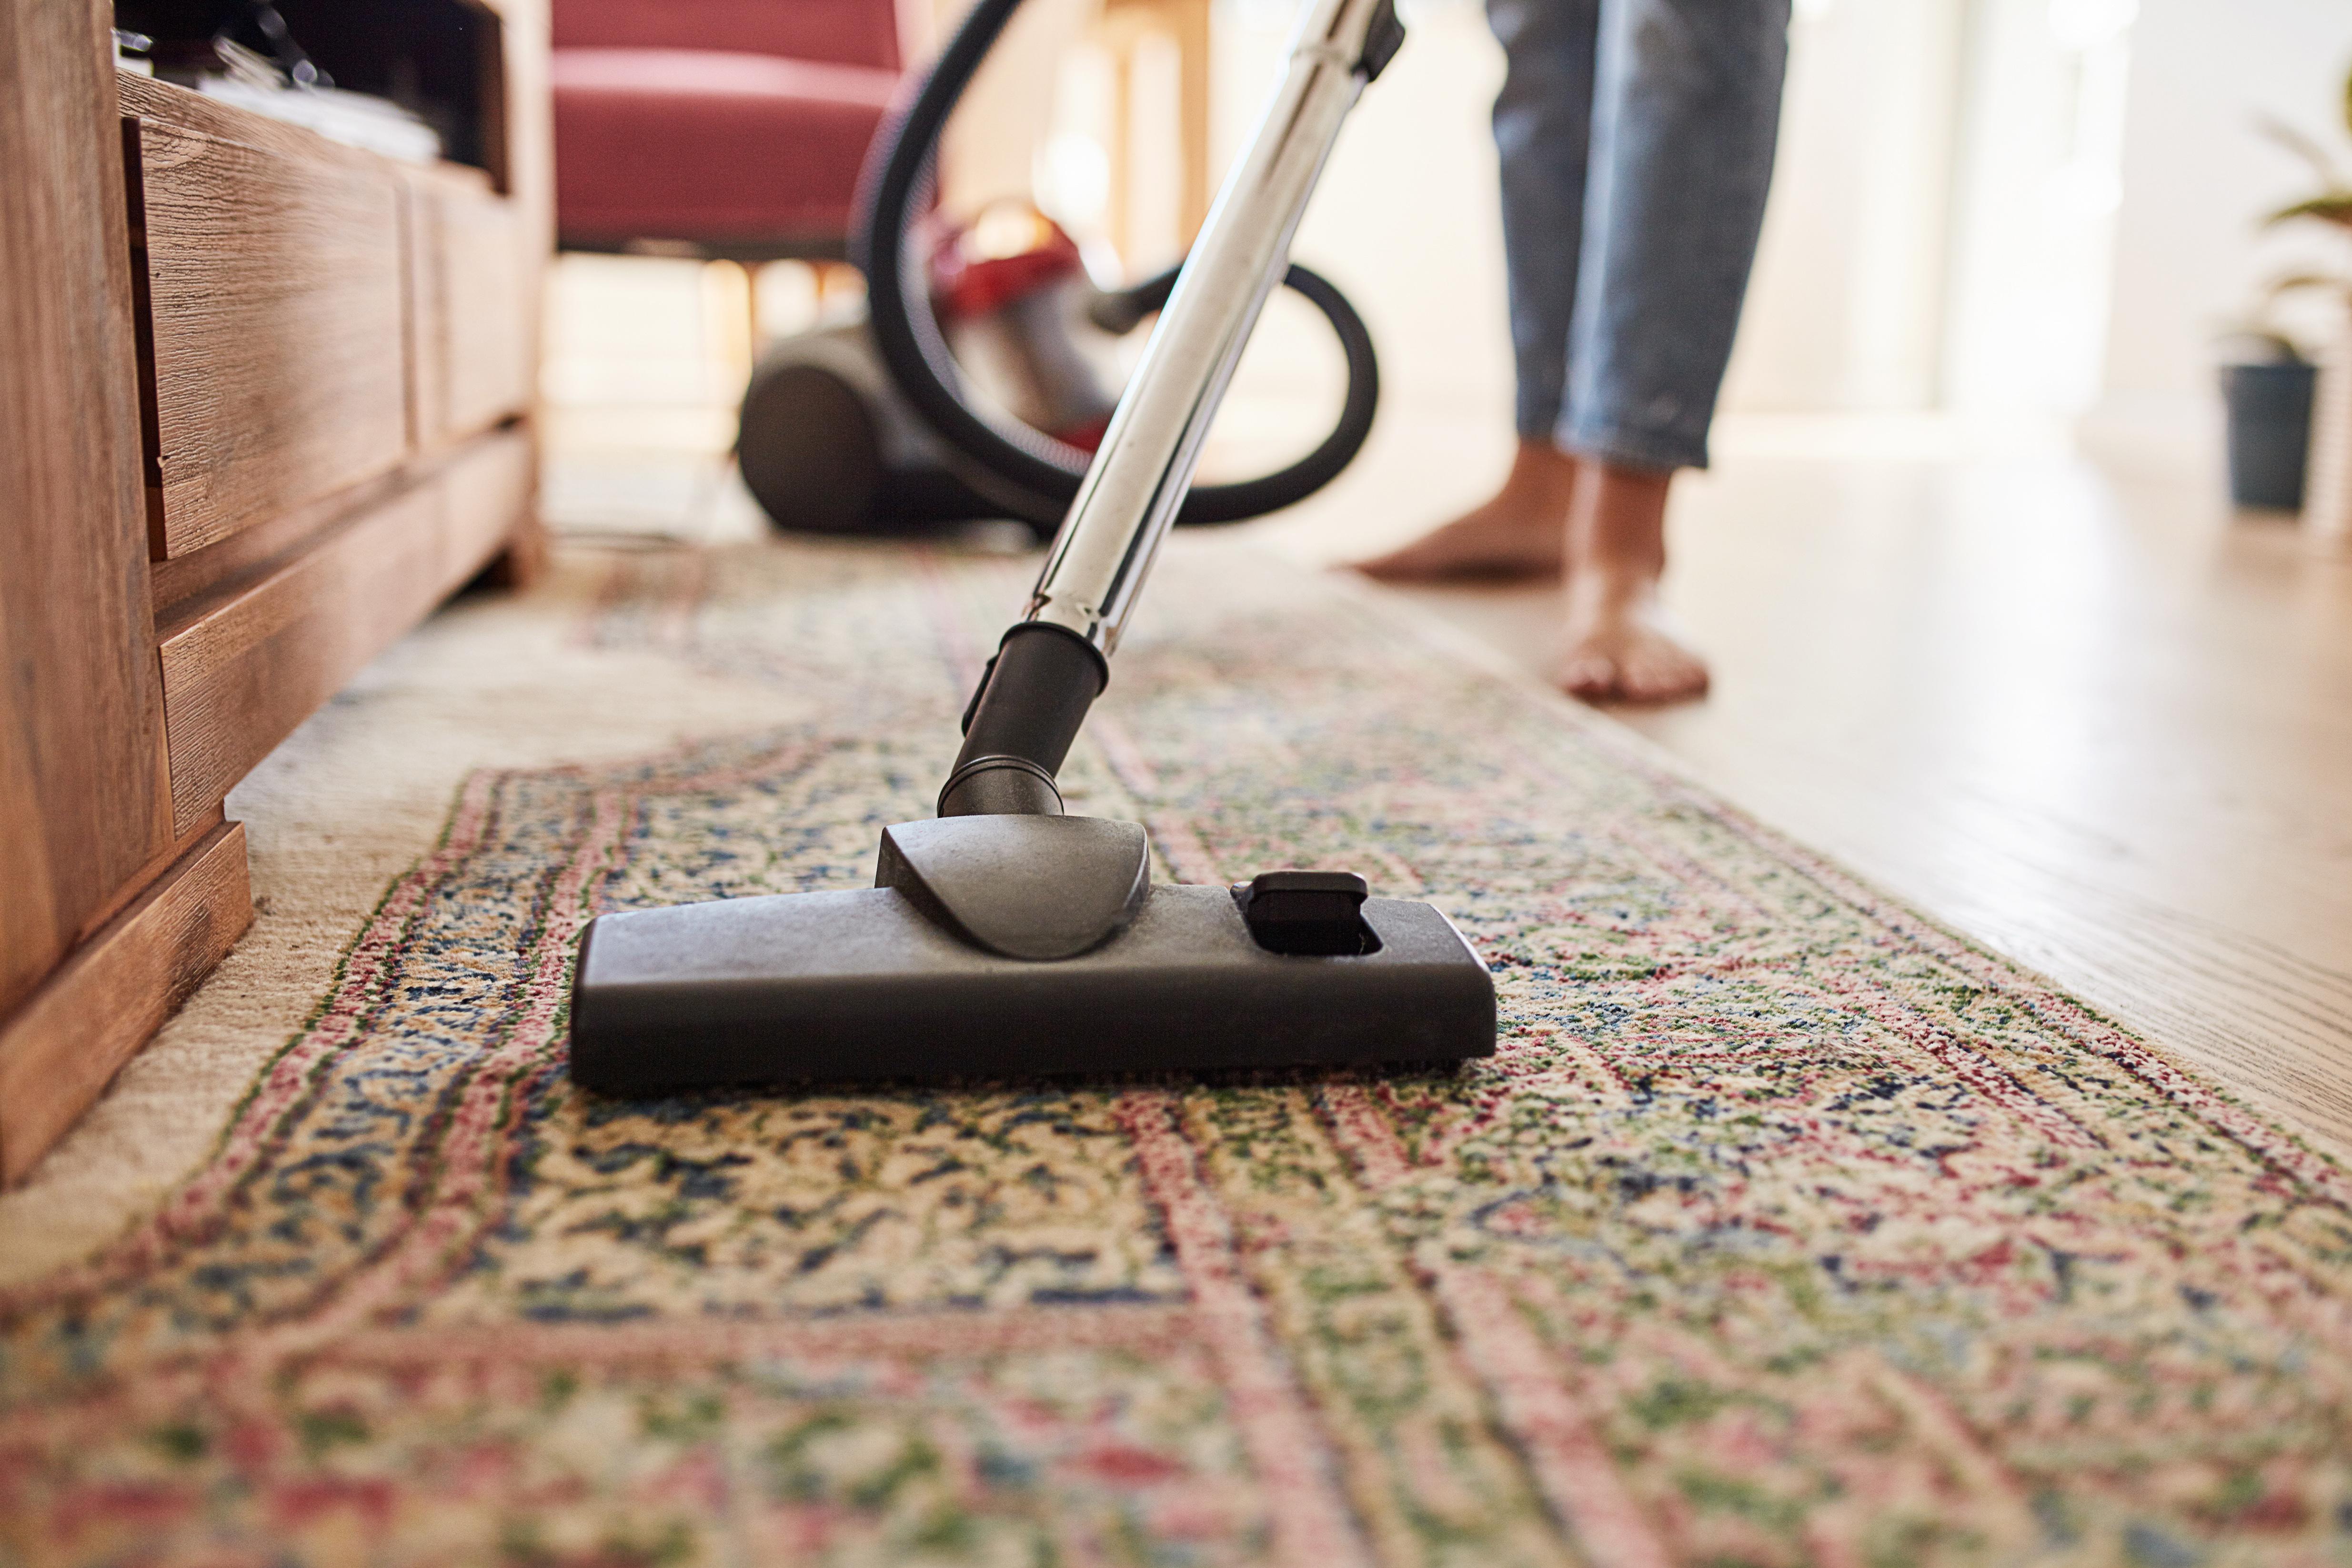 In-Home Services Voucher Program link